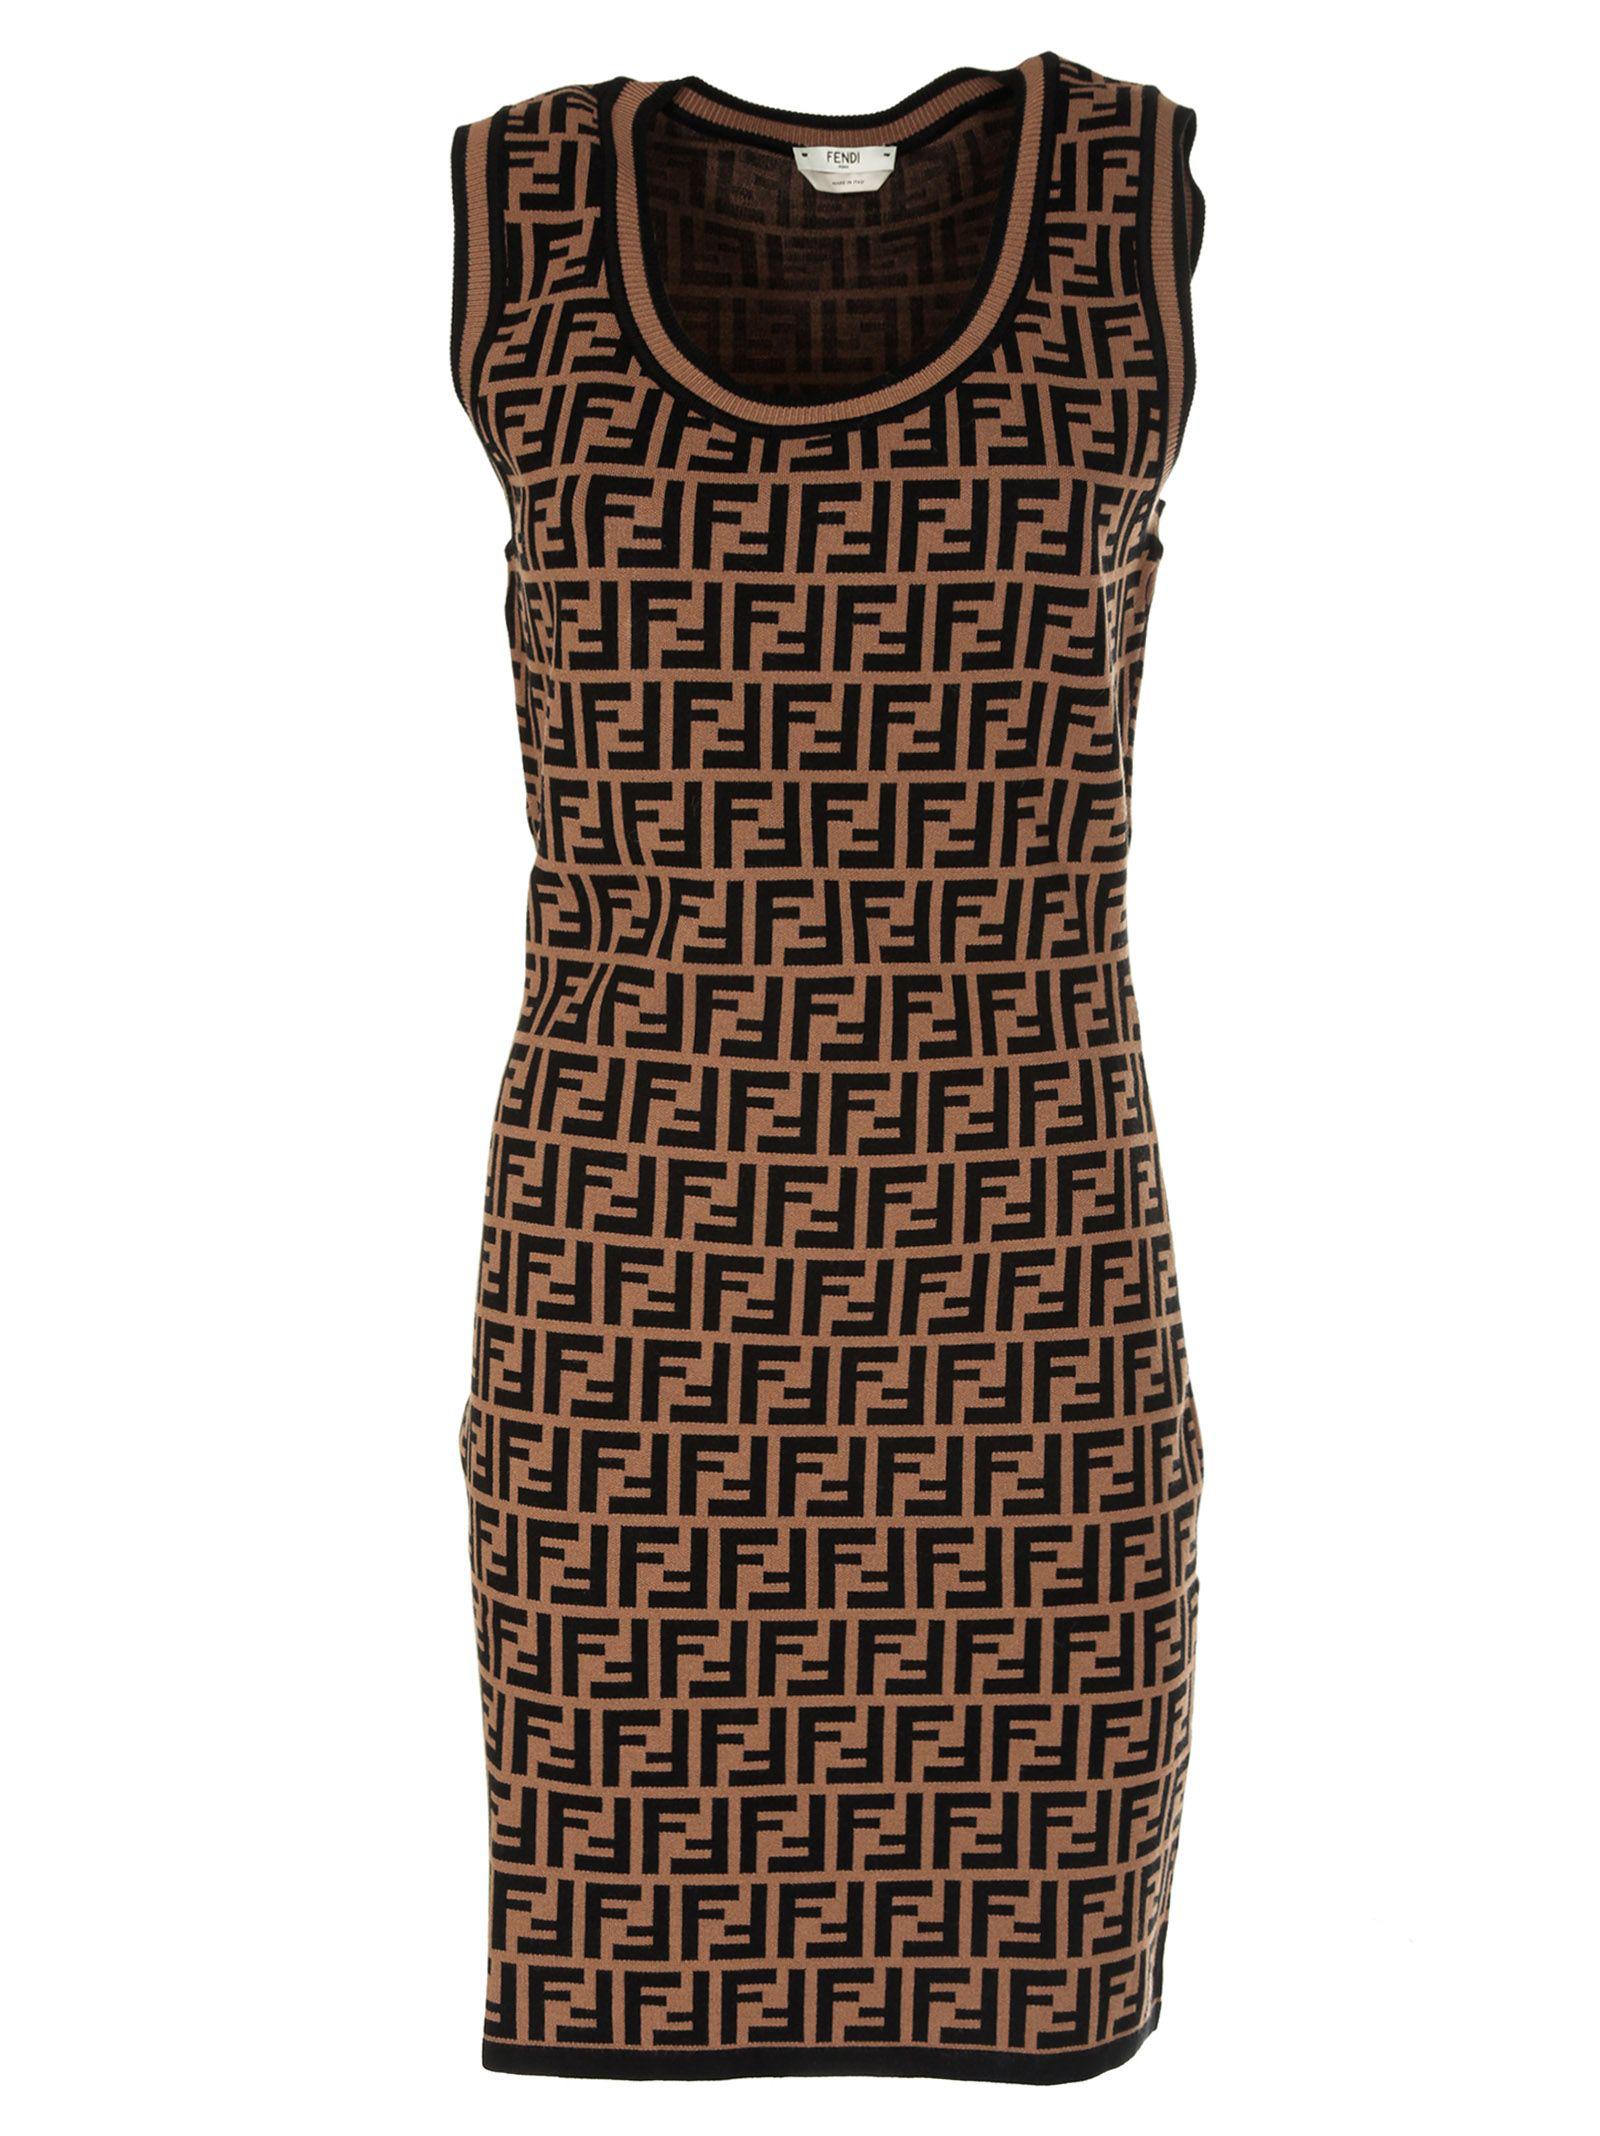 572cddca0677 Fendi Ff-Jacquard Knitted Mini Dress In F118W-Tabacco